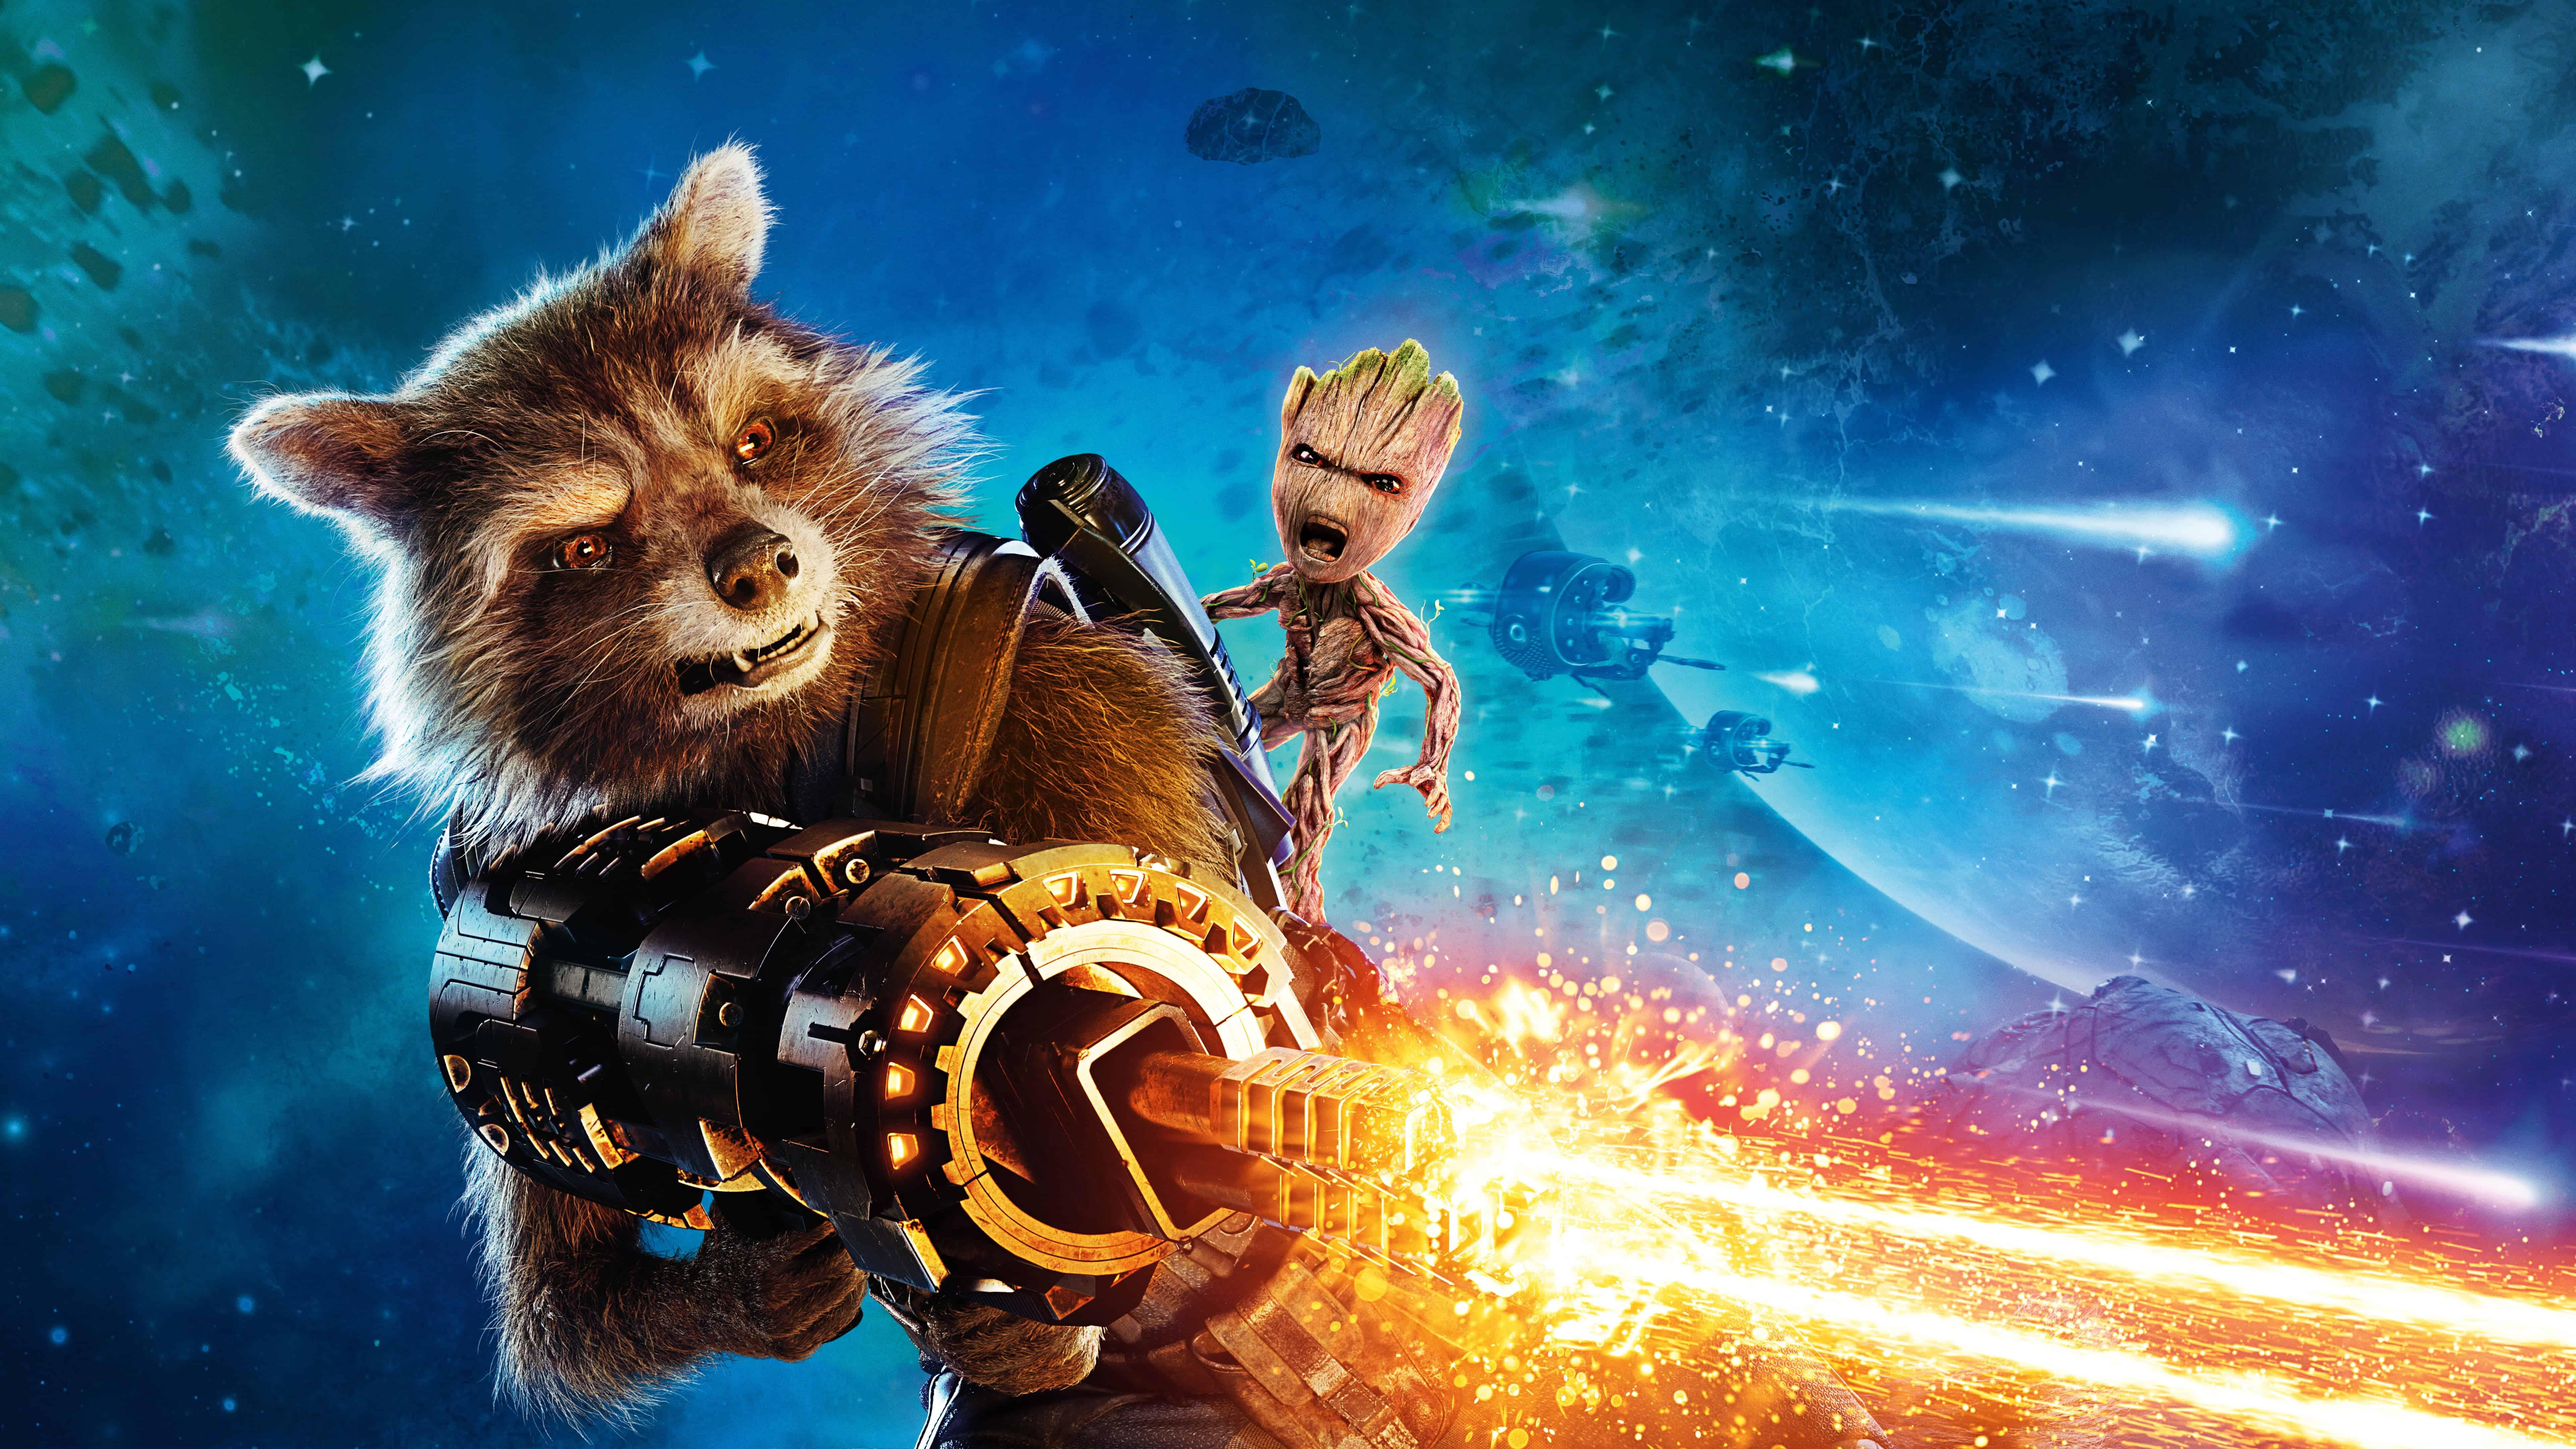 Guardians Of The Galaxy Vol 2 Wallpaper: Guardians Of The Galaxy Vol 2 Rocket UHD 8K Wallpaper